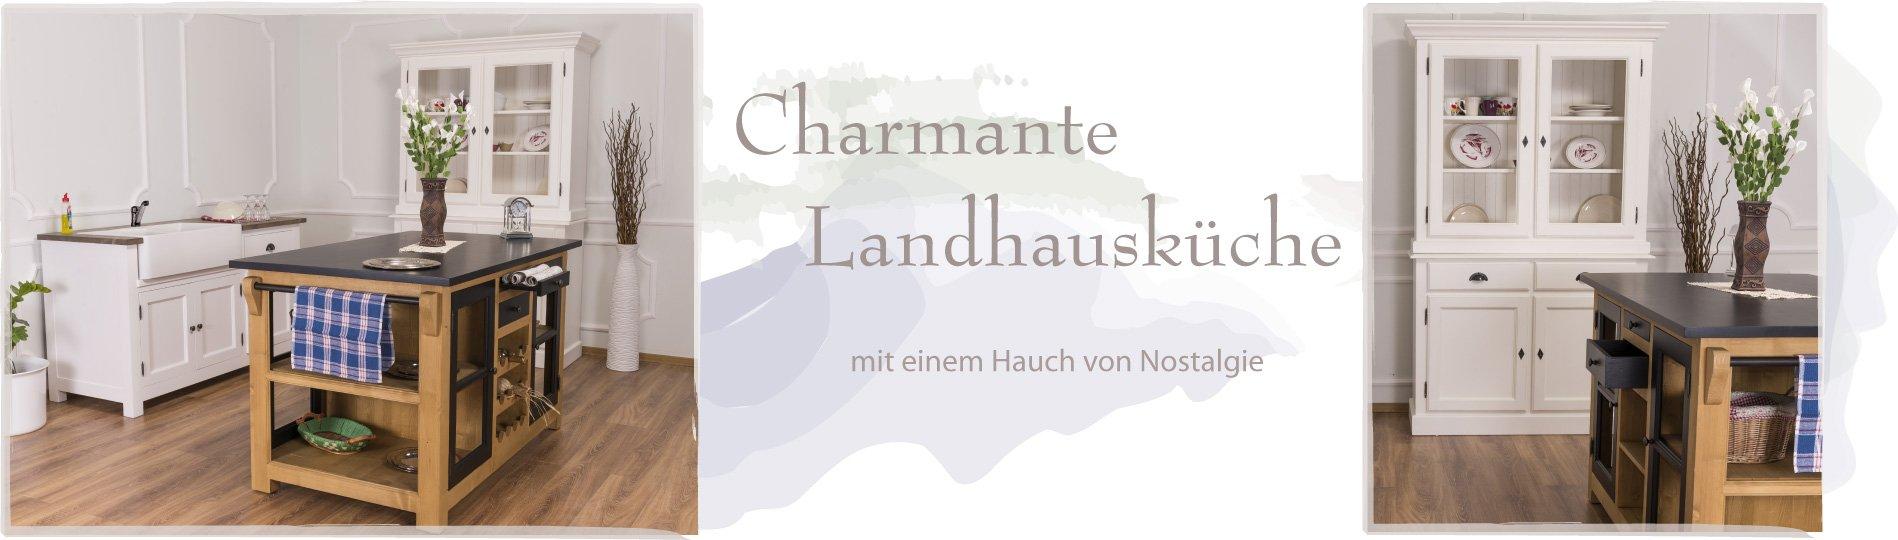 Wohnideen-Kueche_Charmante Landhauskueche